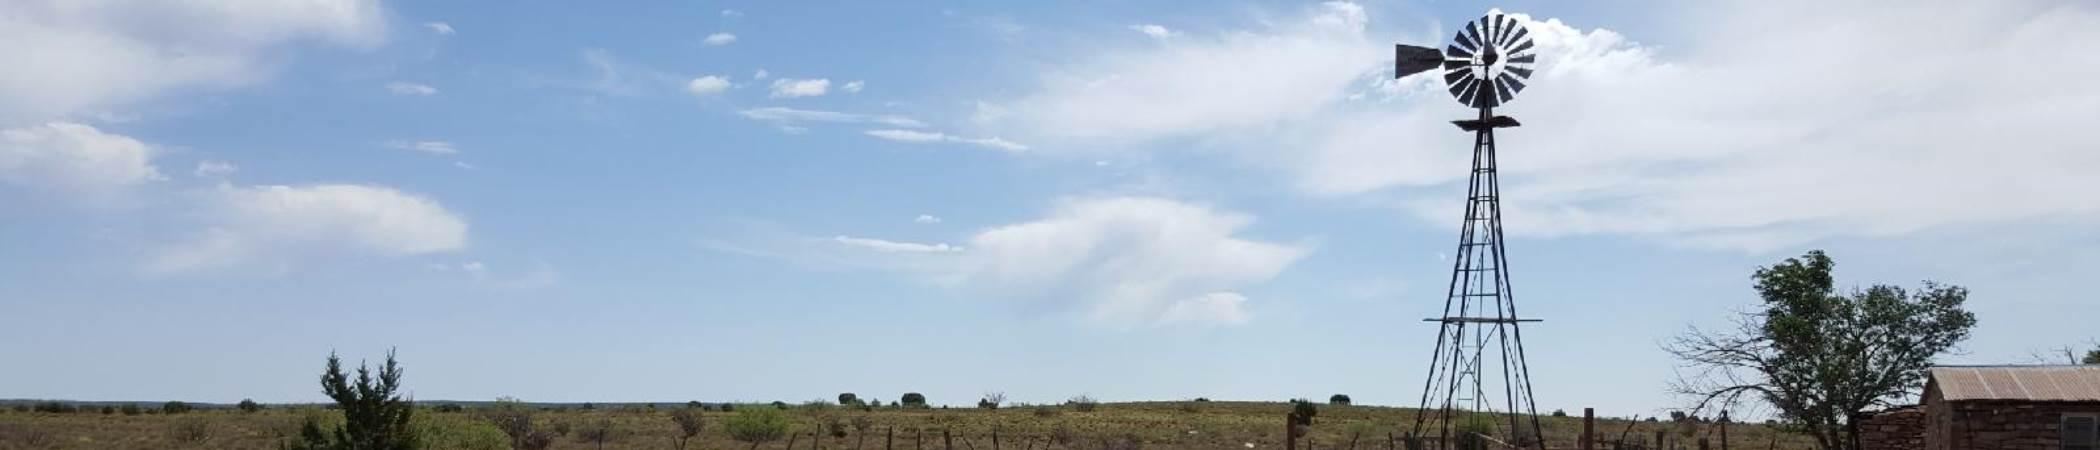 Jason Grisham State Farm Insurance in Lubbock, TX | Home, Auto Insurance & more